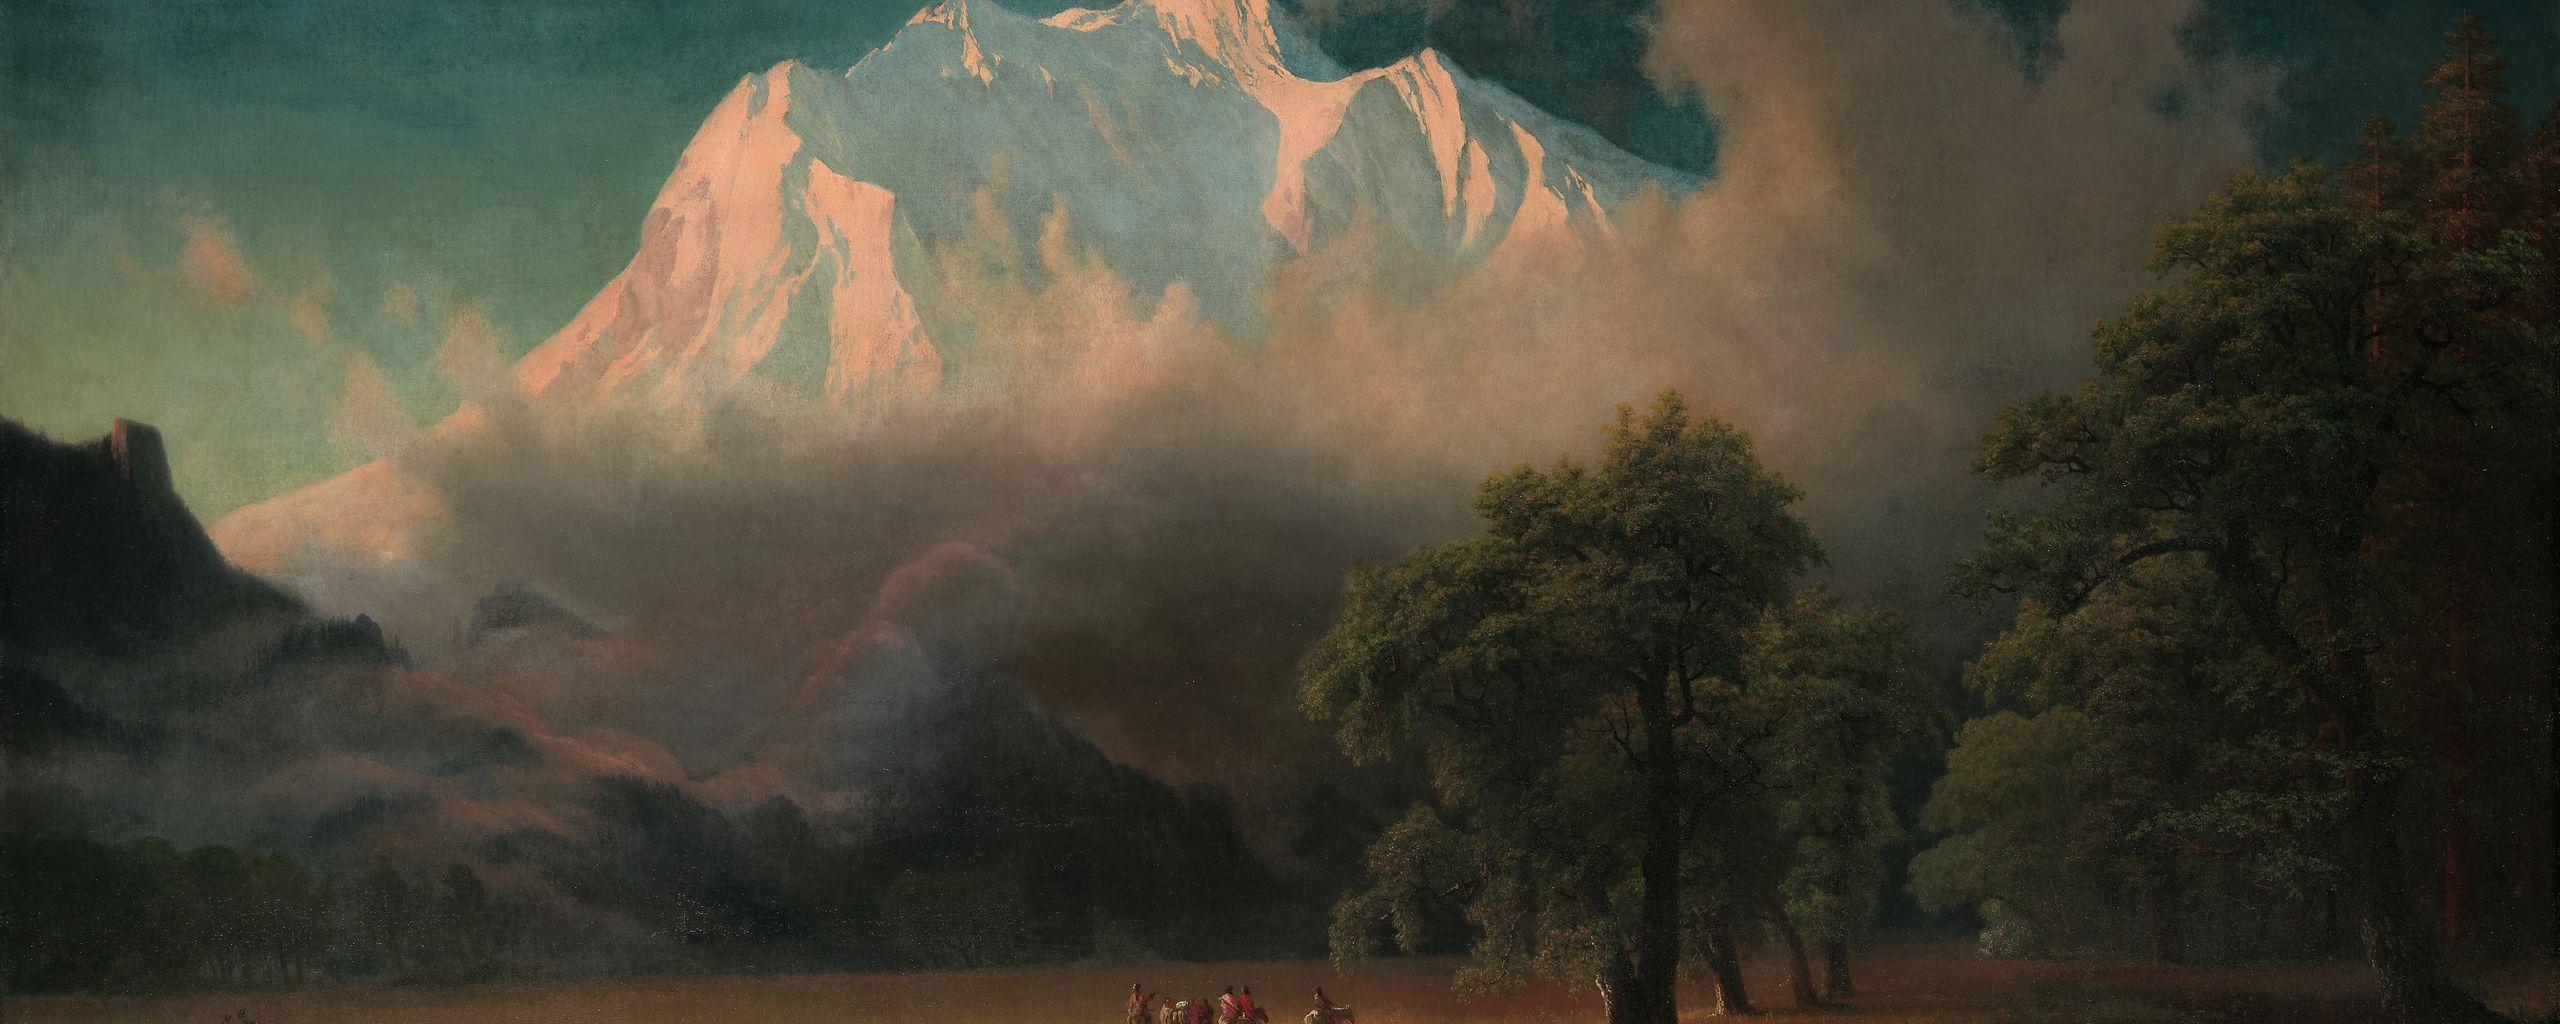 Albert Bierstadt, American, 1830–1902. Mount  Adams, Washington, 1875. Oil on canvas. Gift of Mrs. Jacob N. Beam.